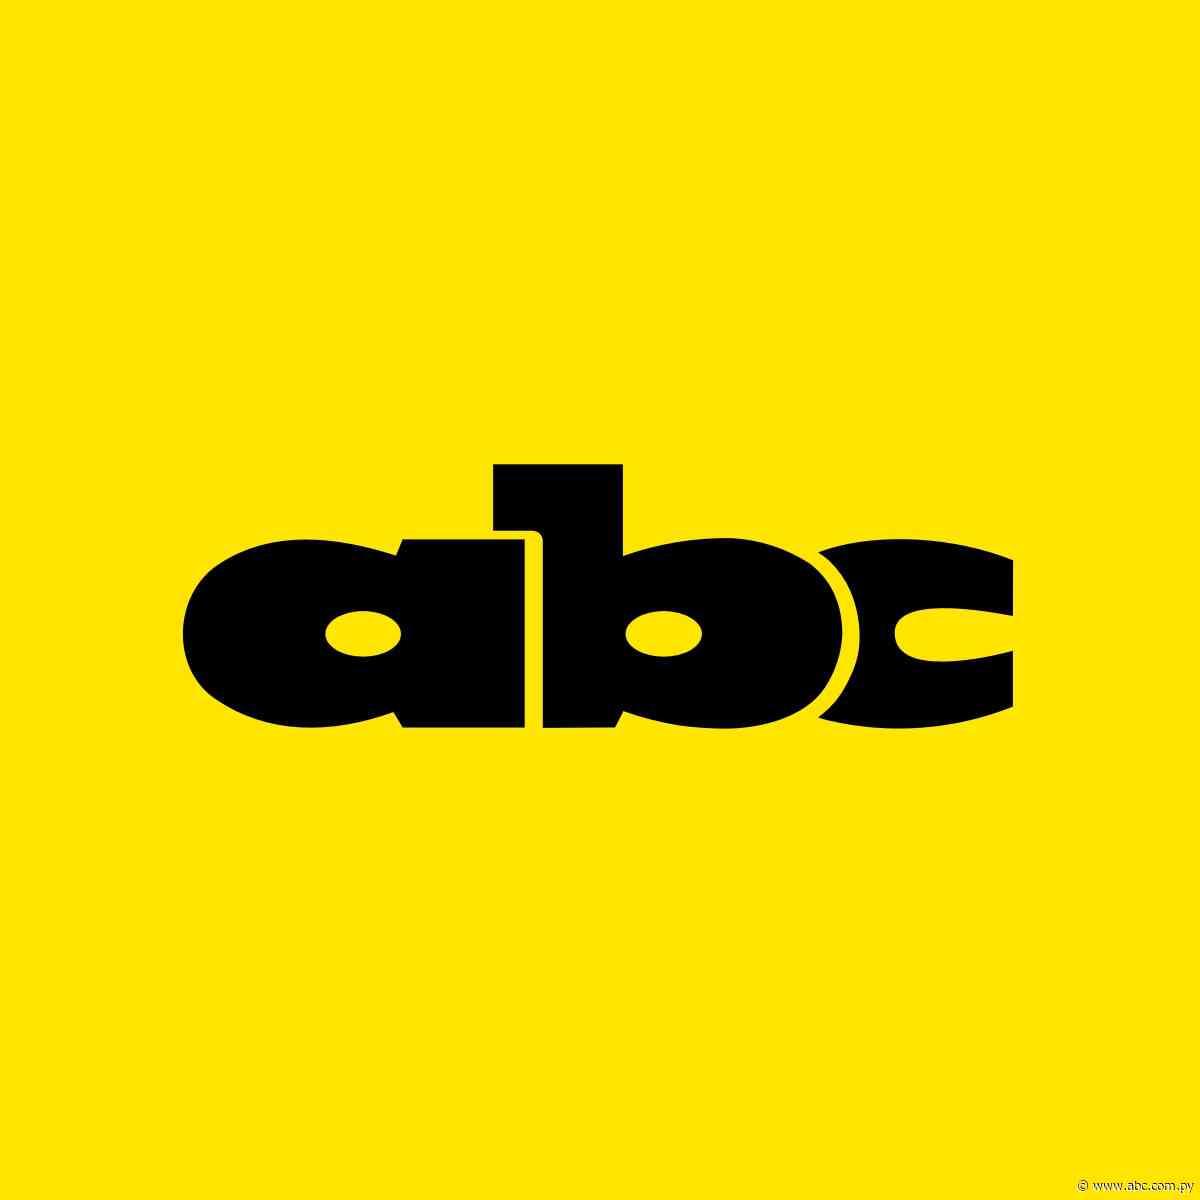 Nanawa anexará a Beterette Cue - Nacionales - ABC Color